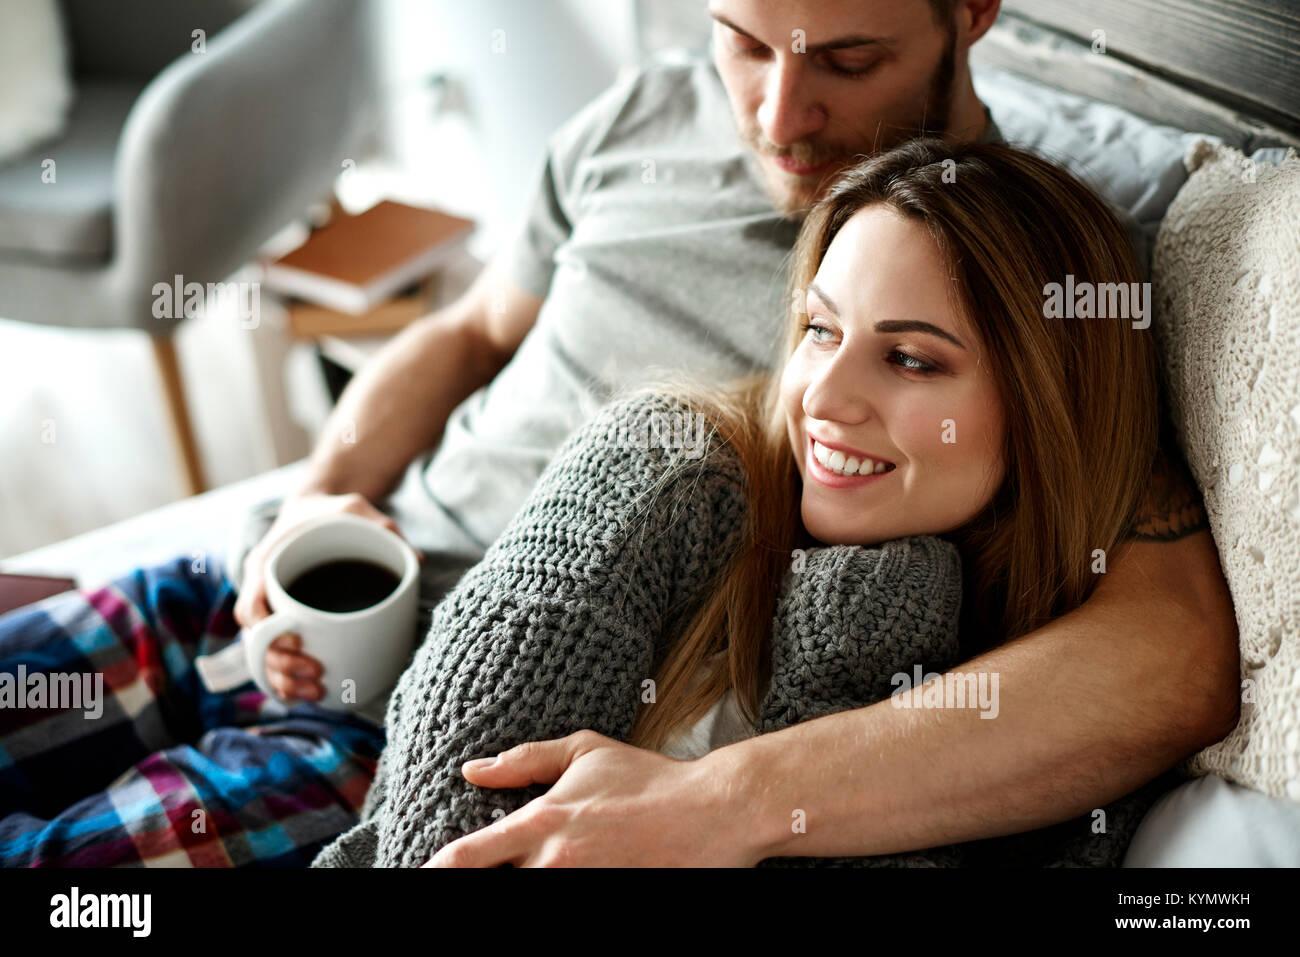 Abrazó afectuosa pareja acostada Imagen De Stock